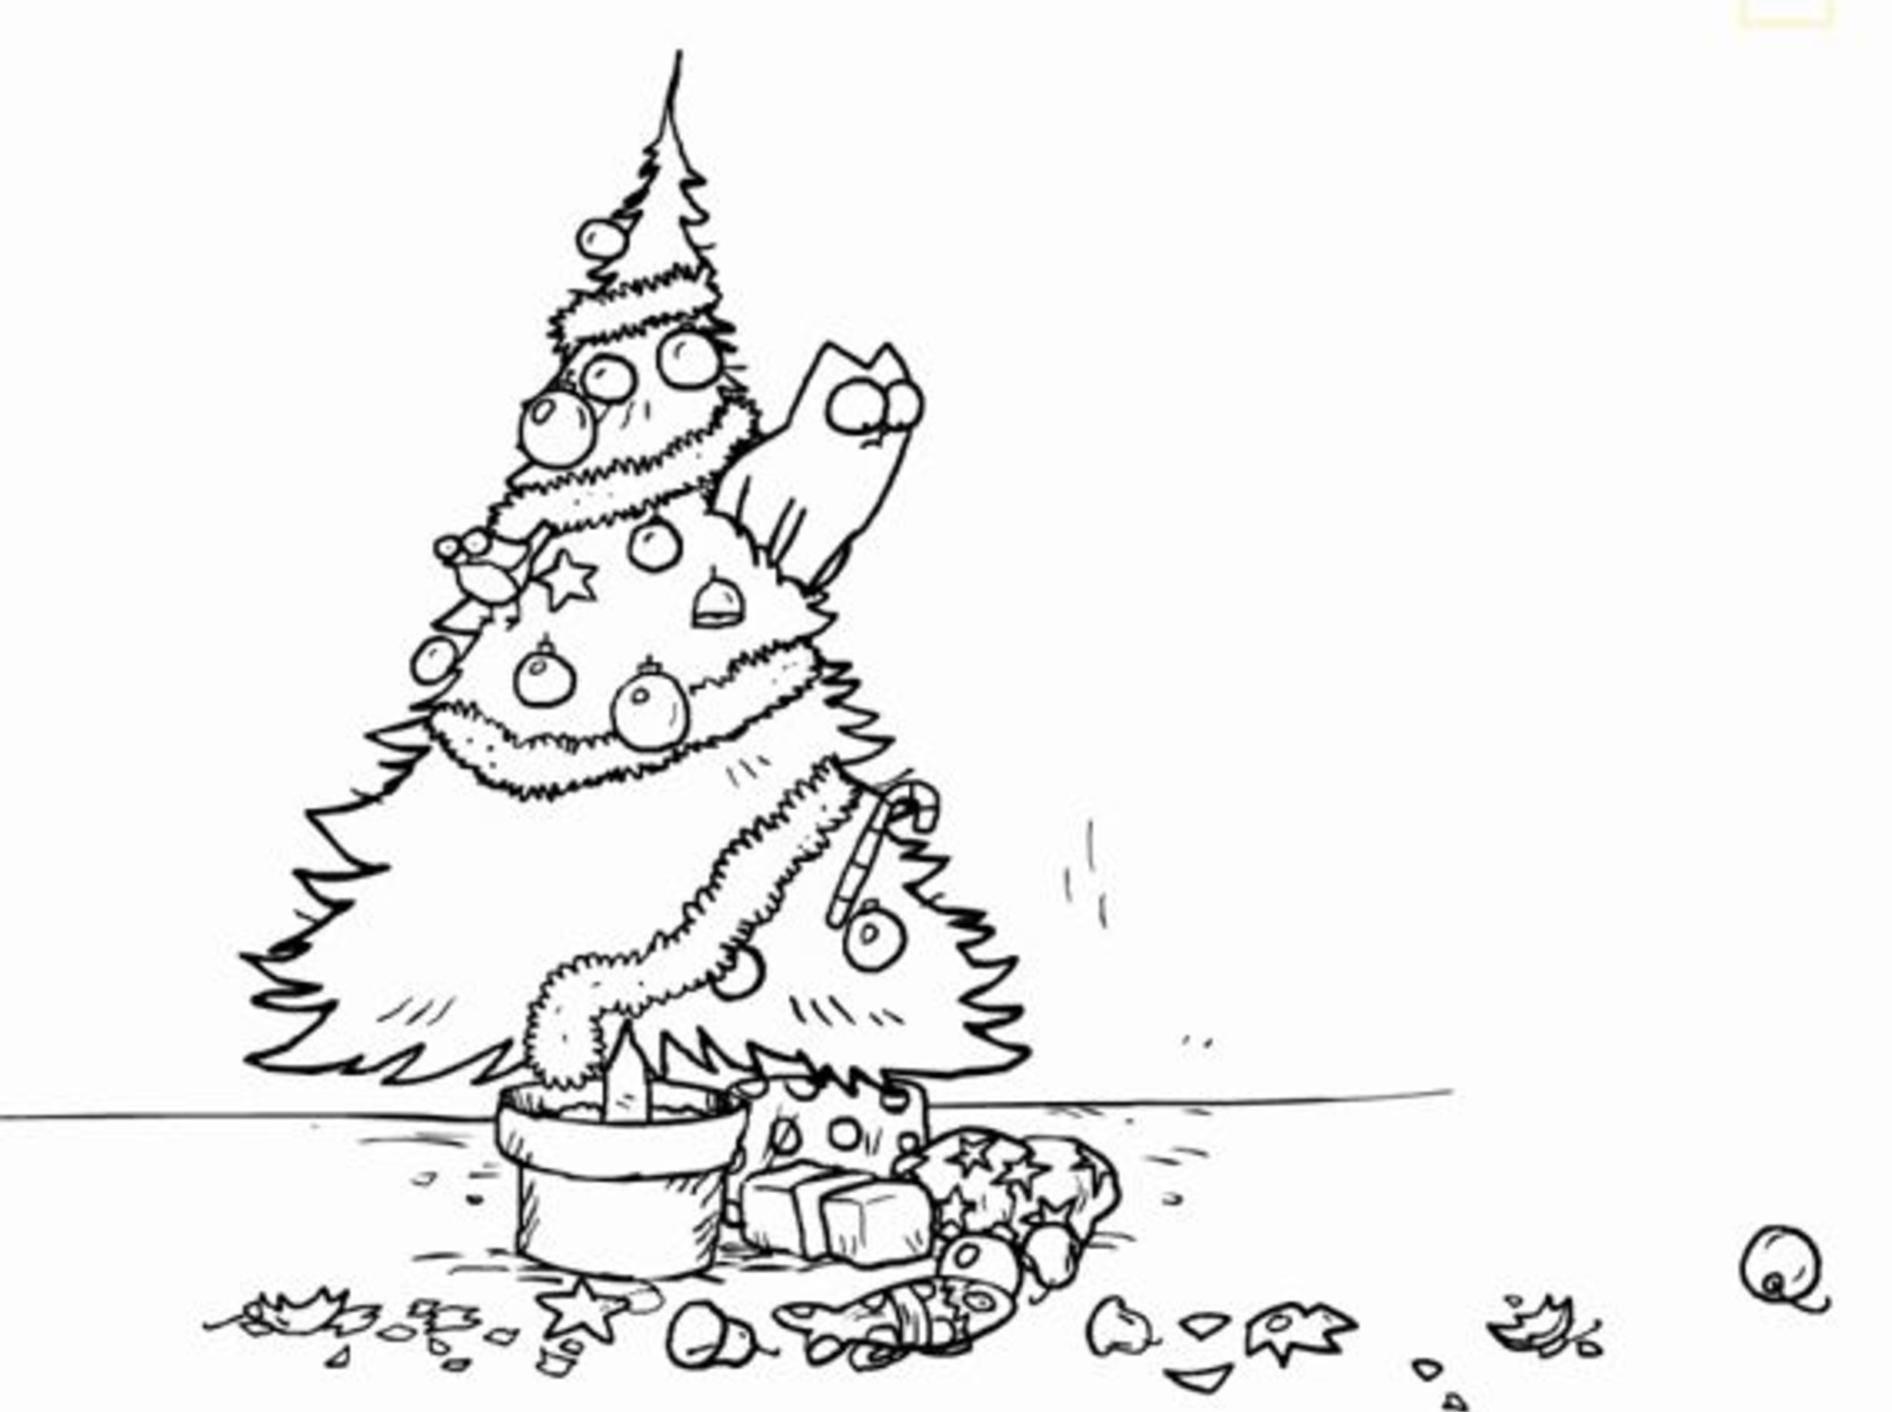 Simon's Cat zerstört Weihnachtsbaum – YouTube / Simon's Cat